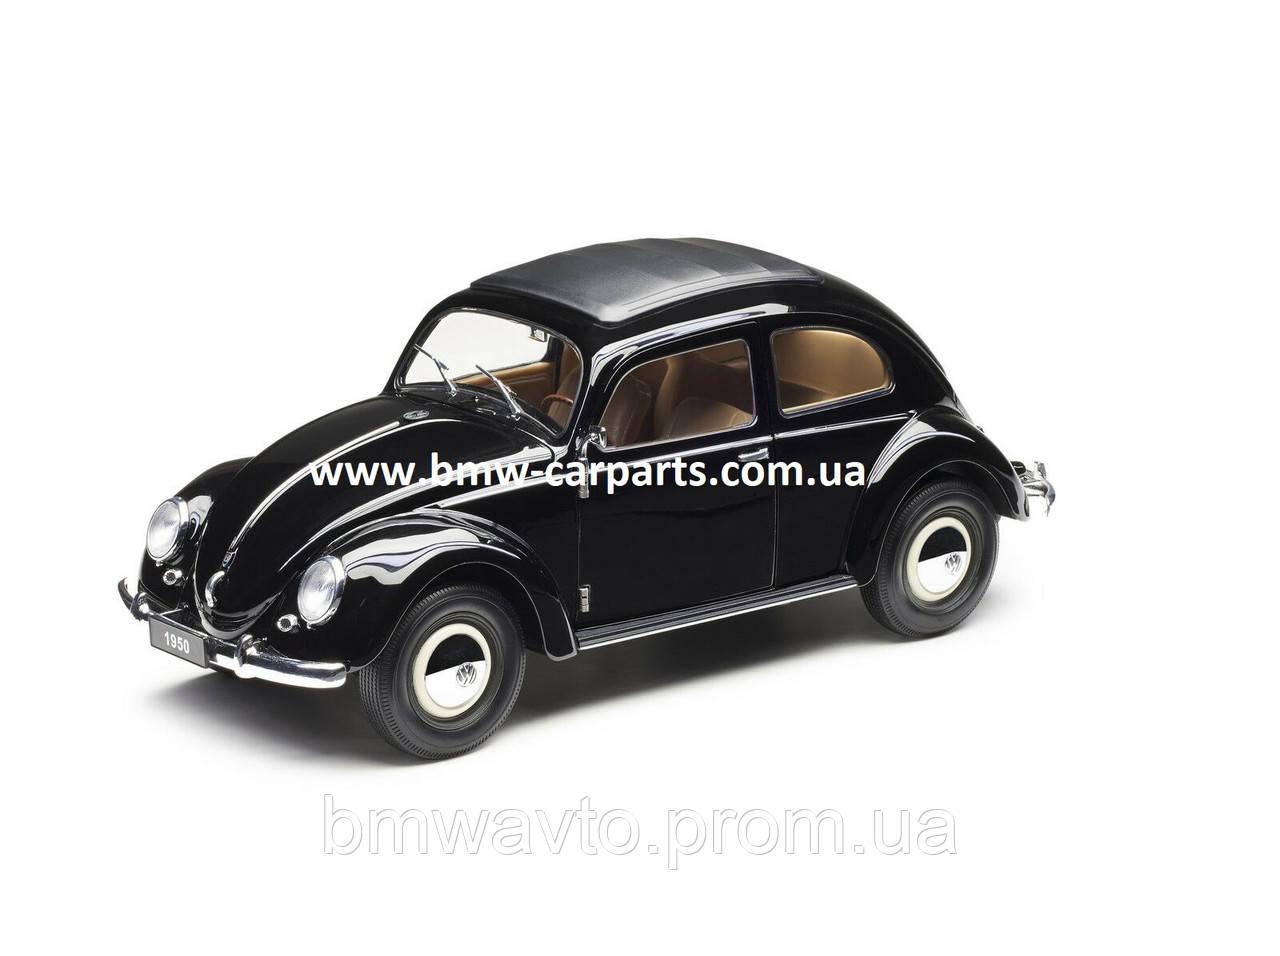 Модель автомобиля Volkswagen Beetle 1950, Scale 1:18